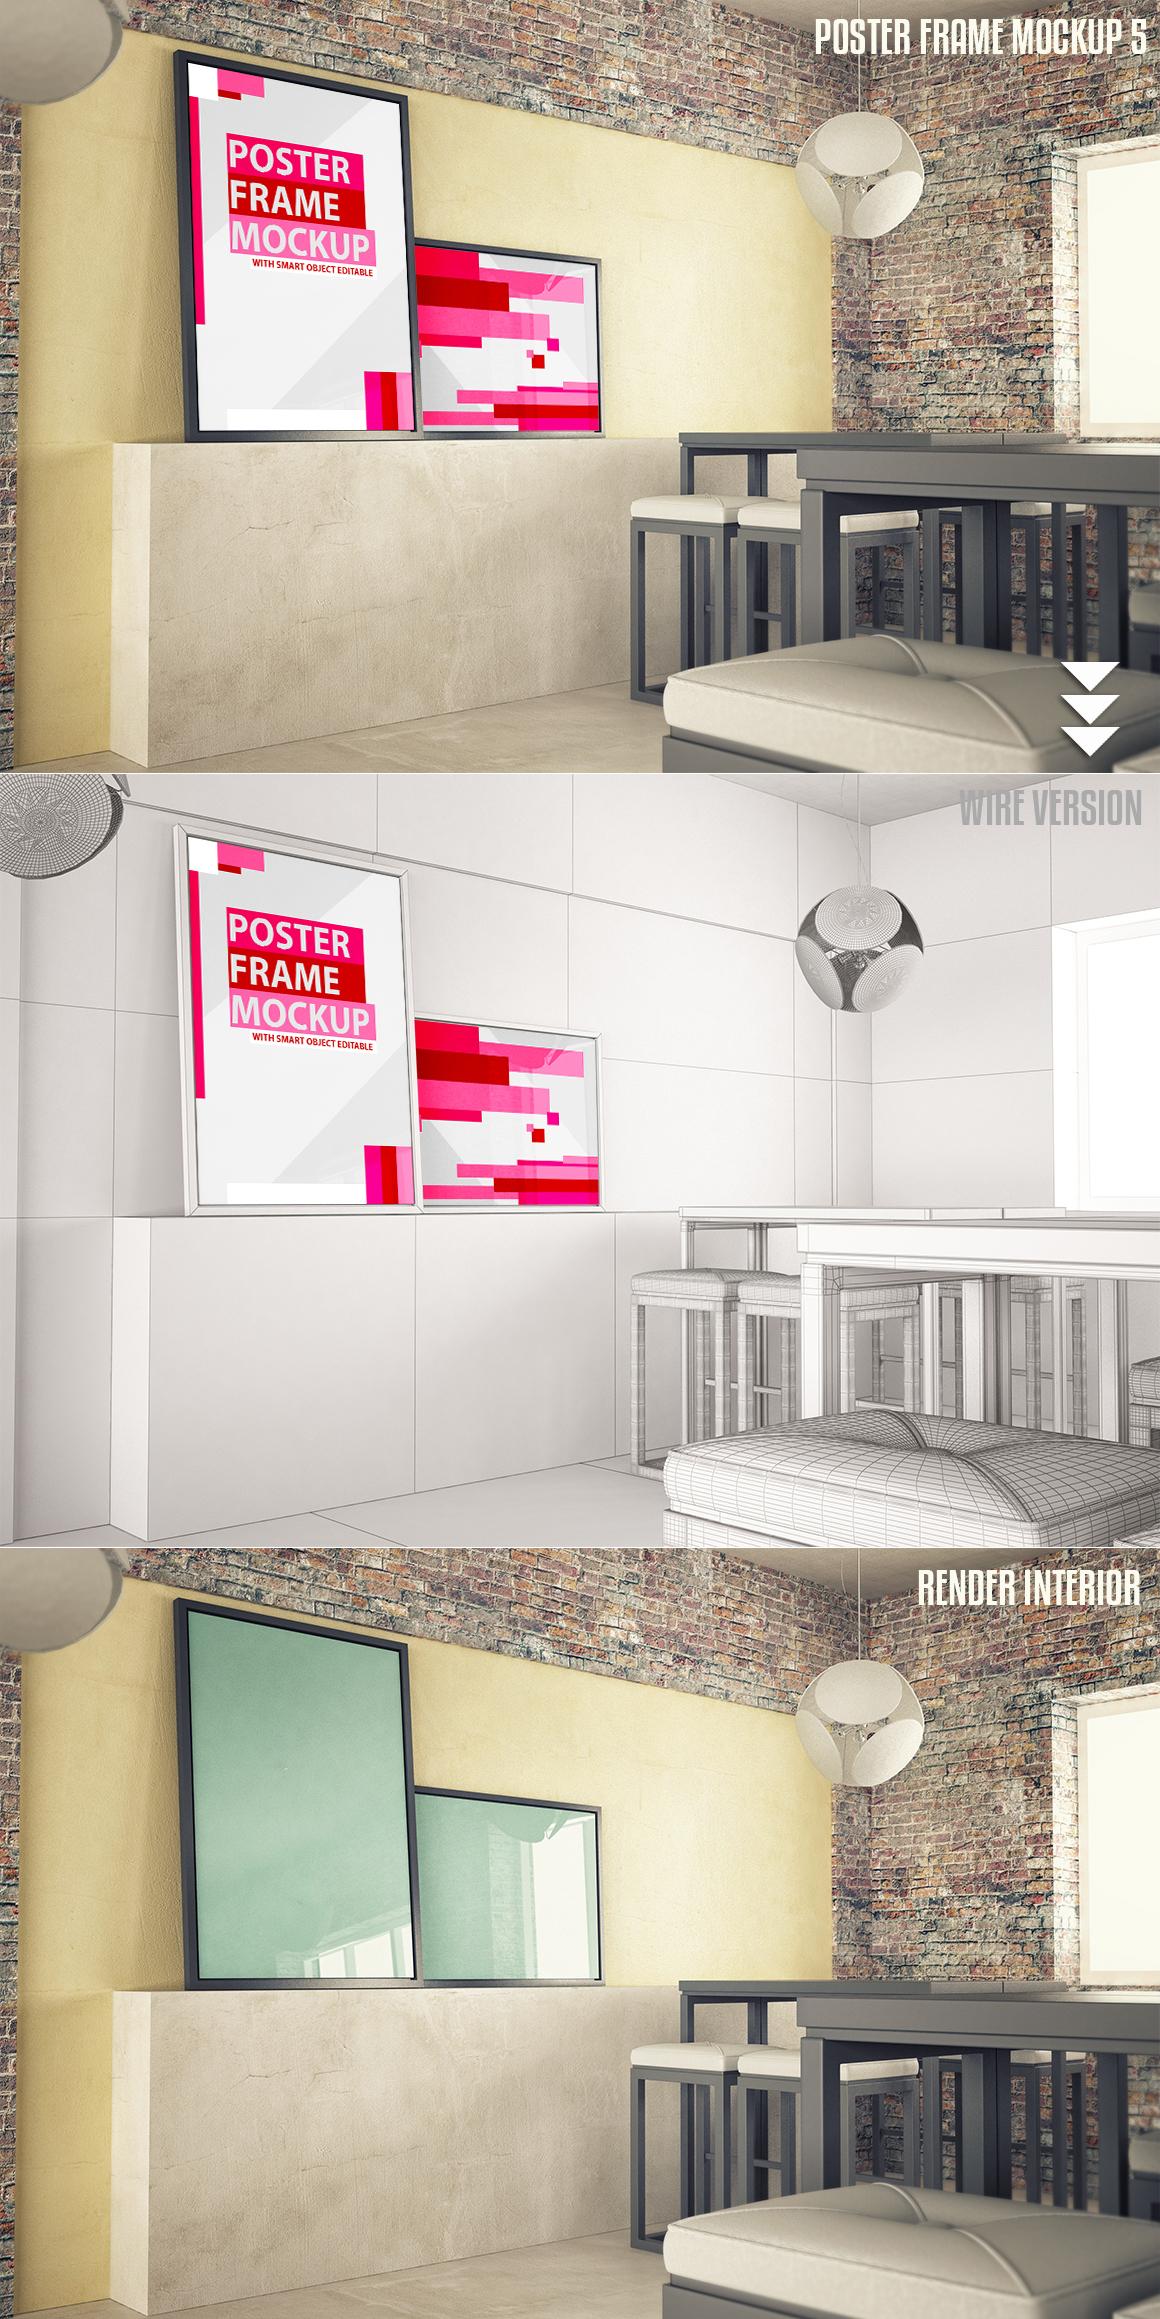 Interiors mock-up Vol. 2 example image 9